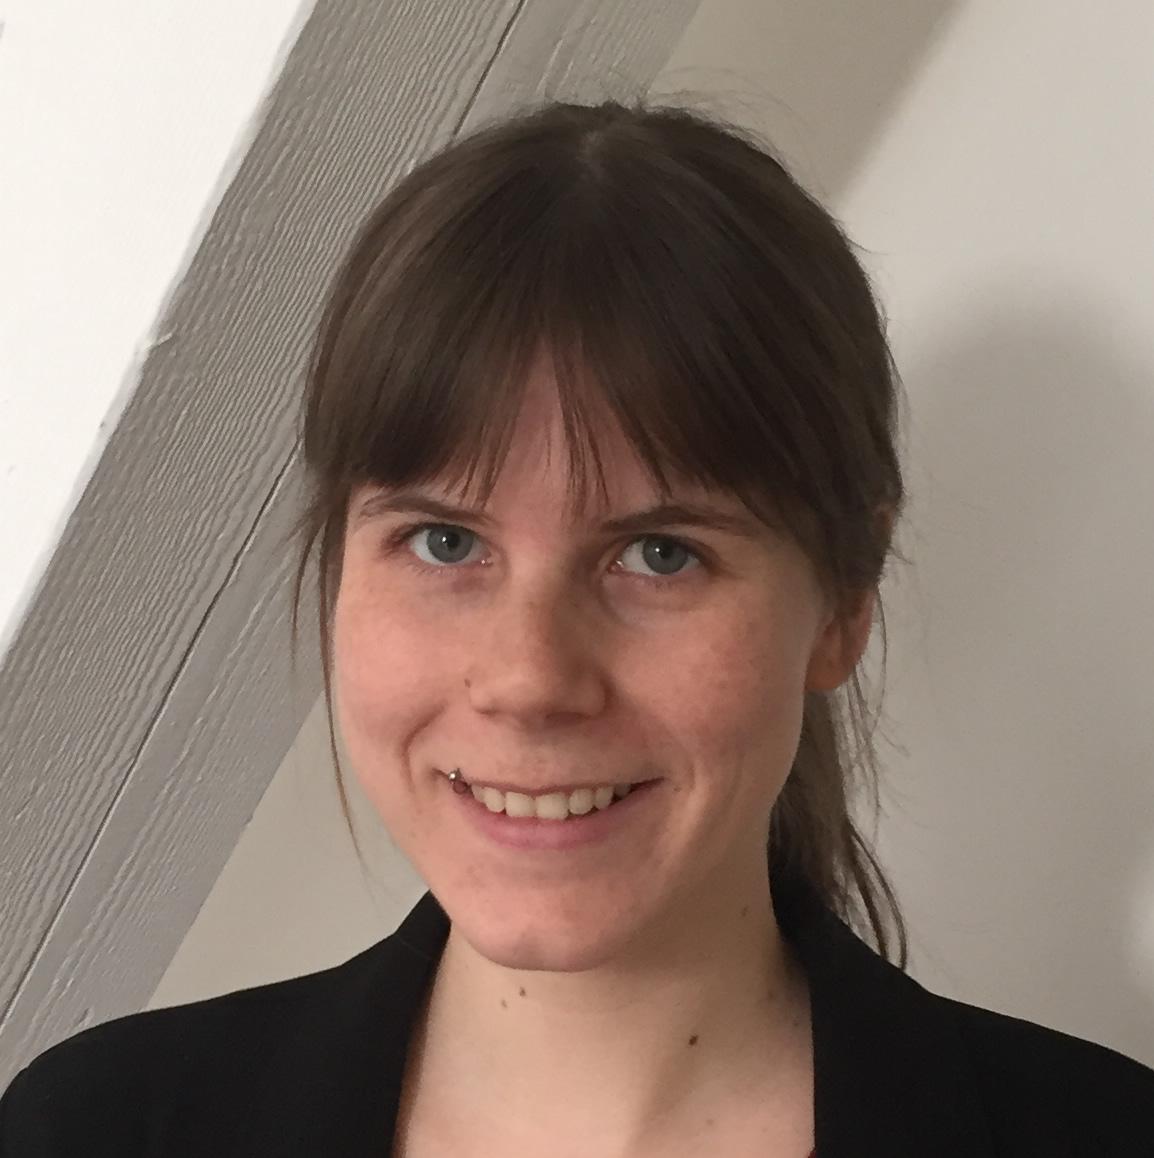 Marina Amstad